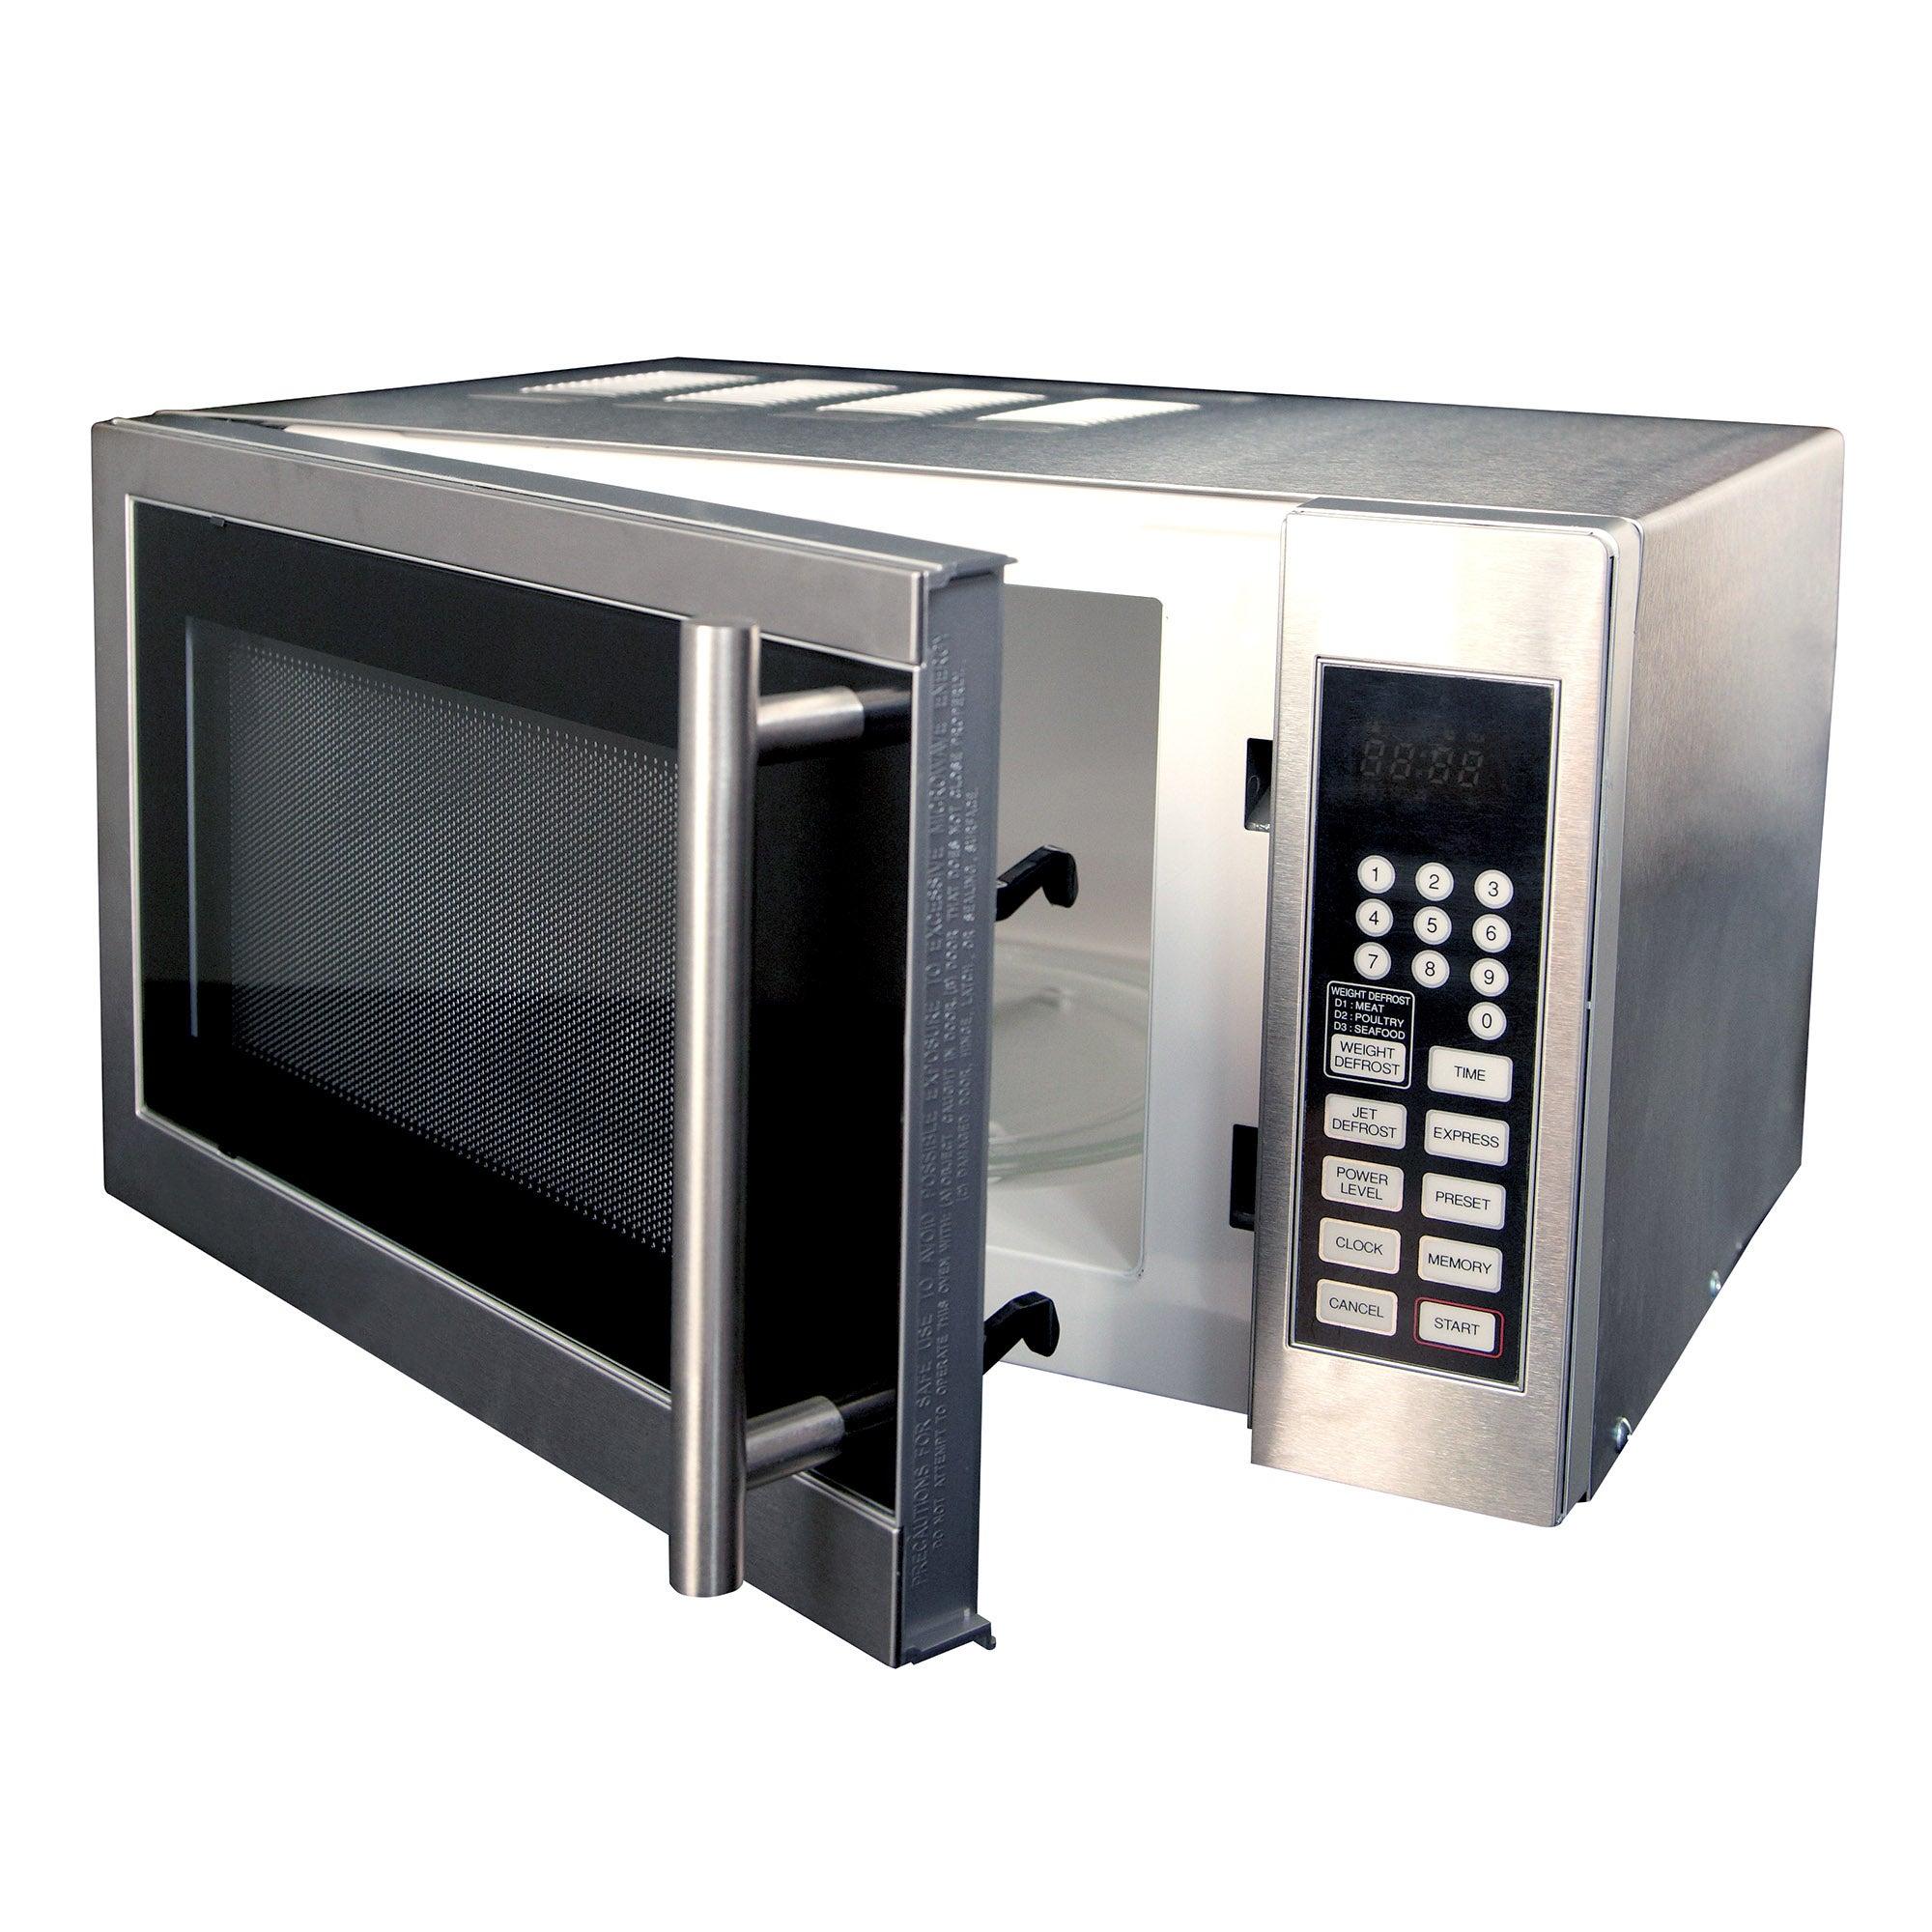 Dunelm 20L Silver Digital Microwave Silver